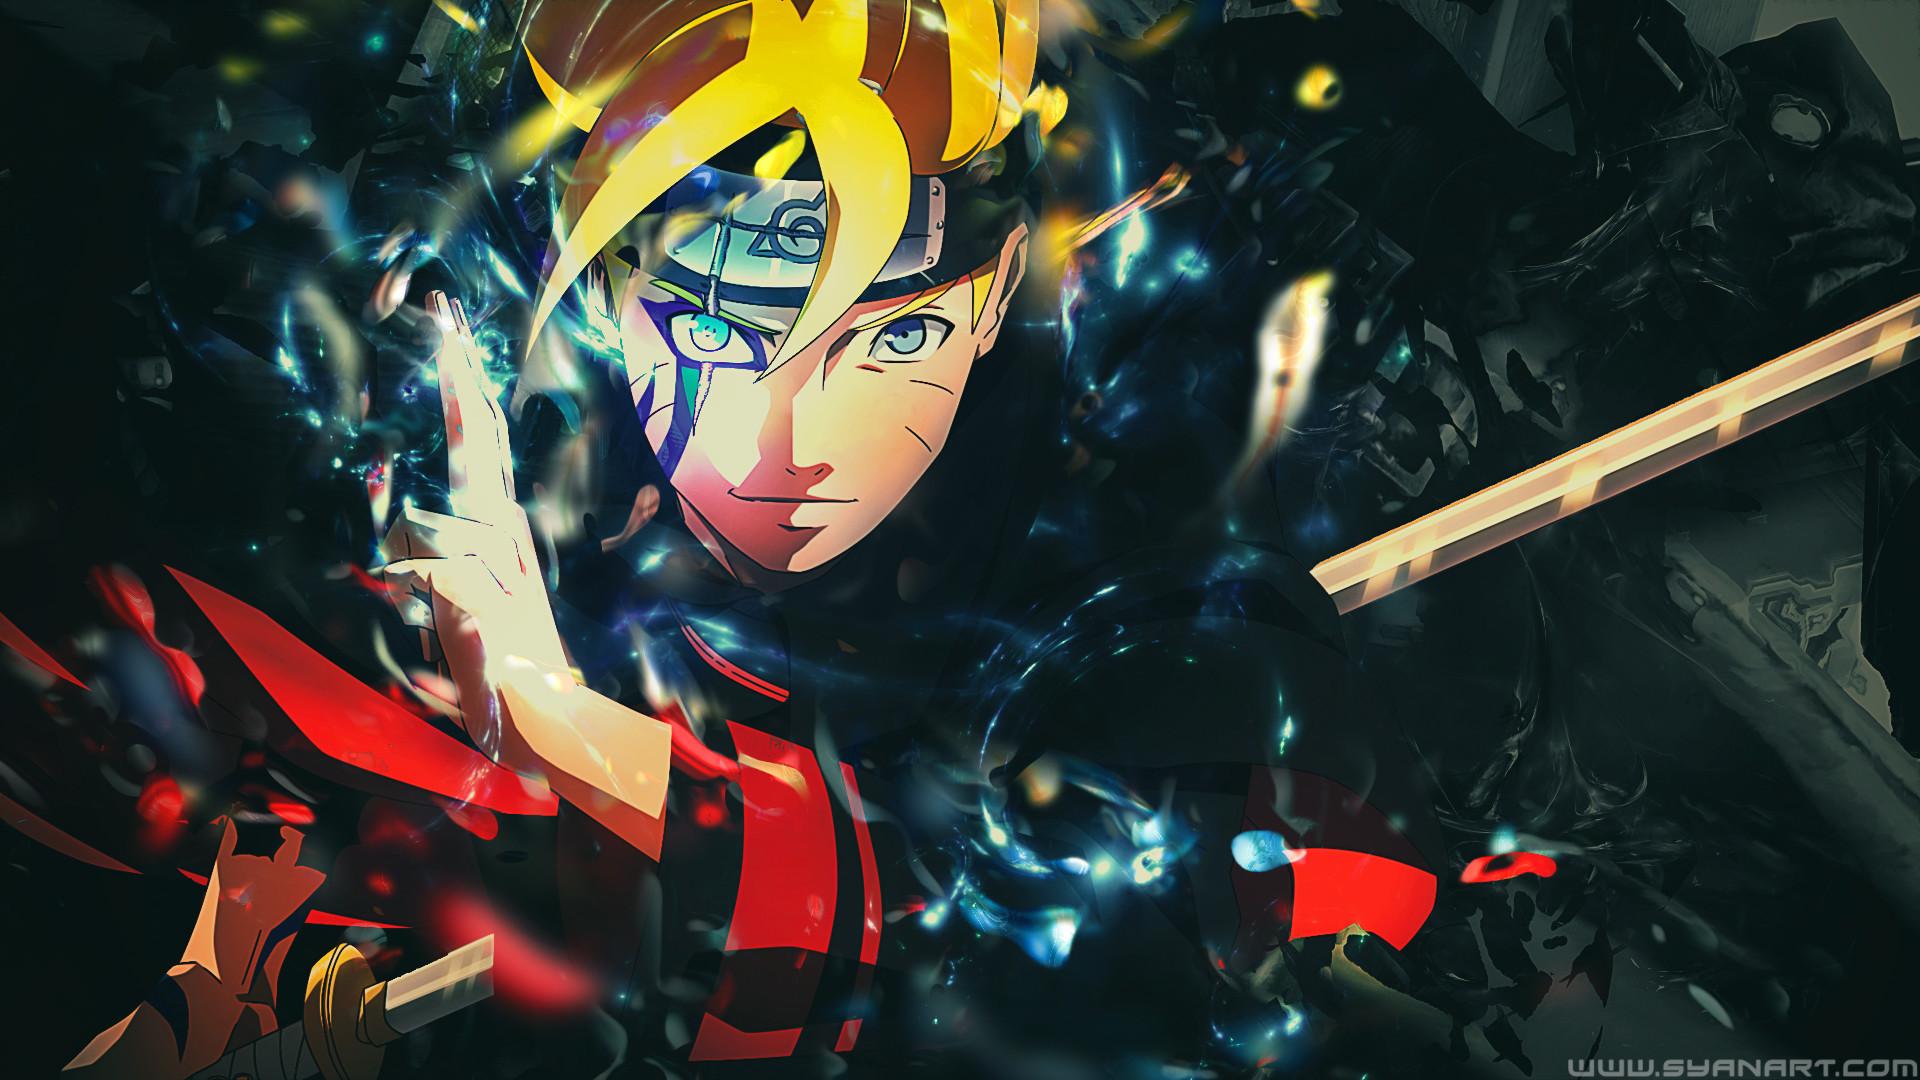 Kyuubi Naruto wallpapers 1920x1080 Full HD 1080p desktop